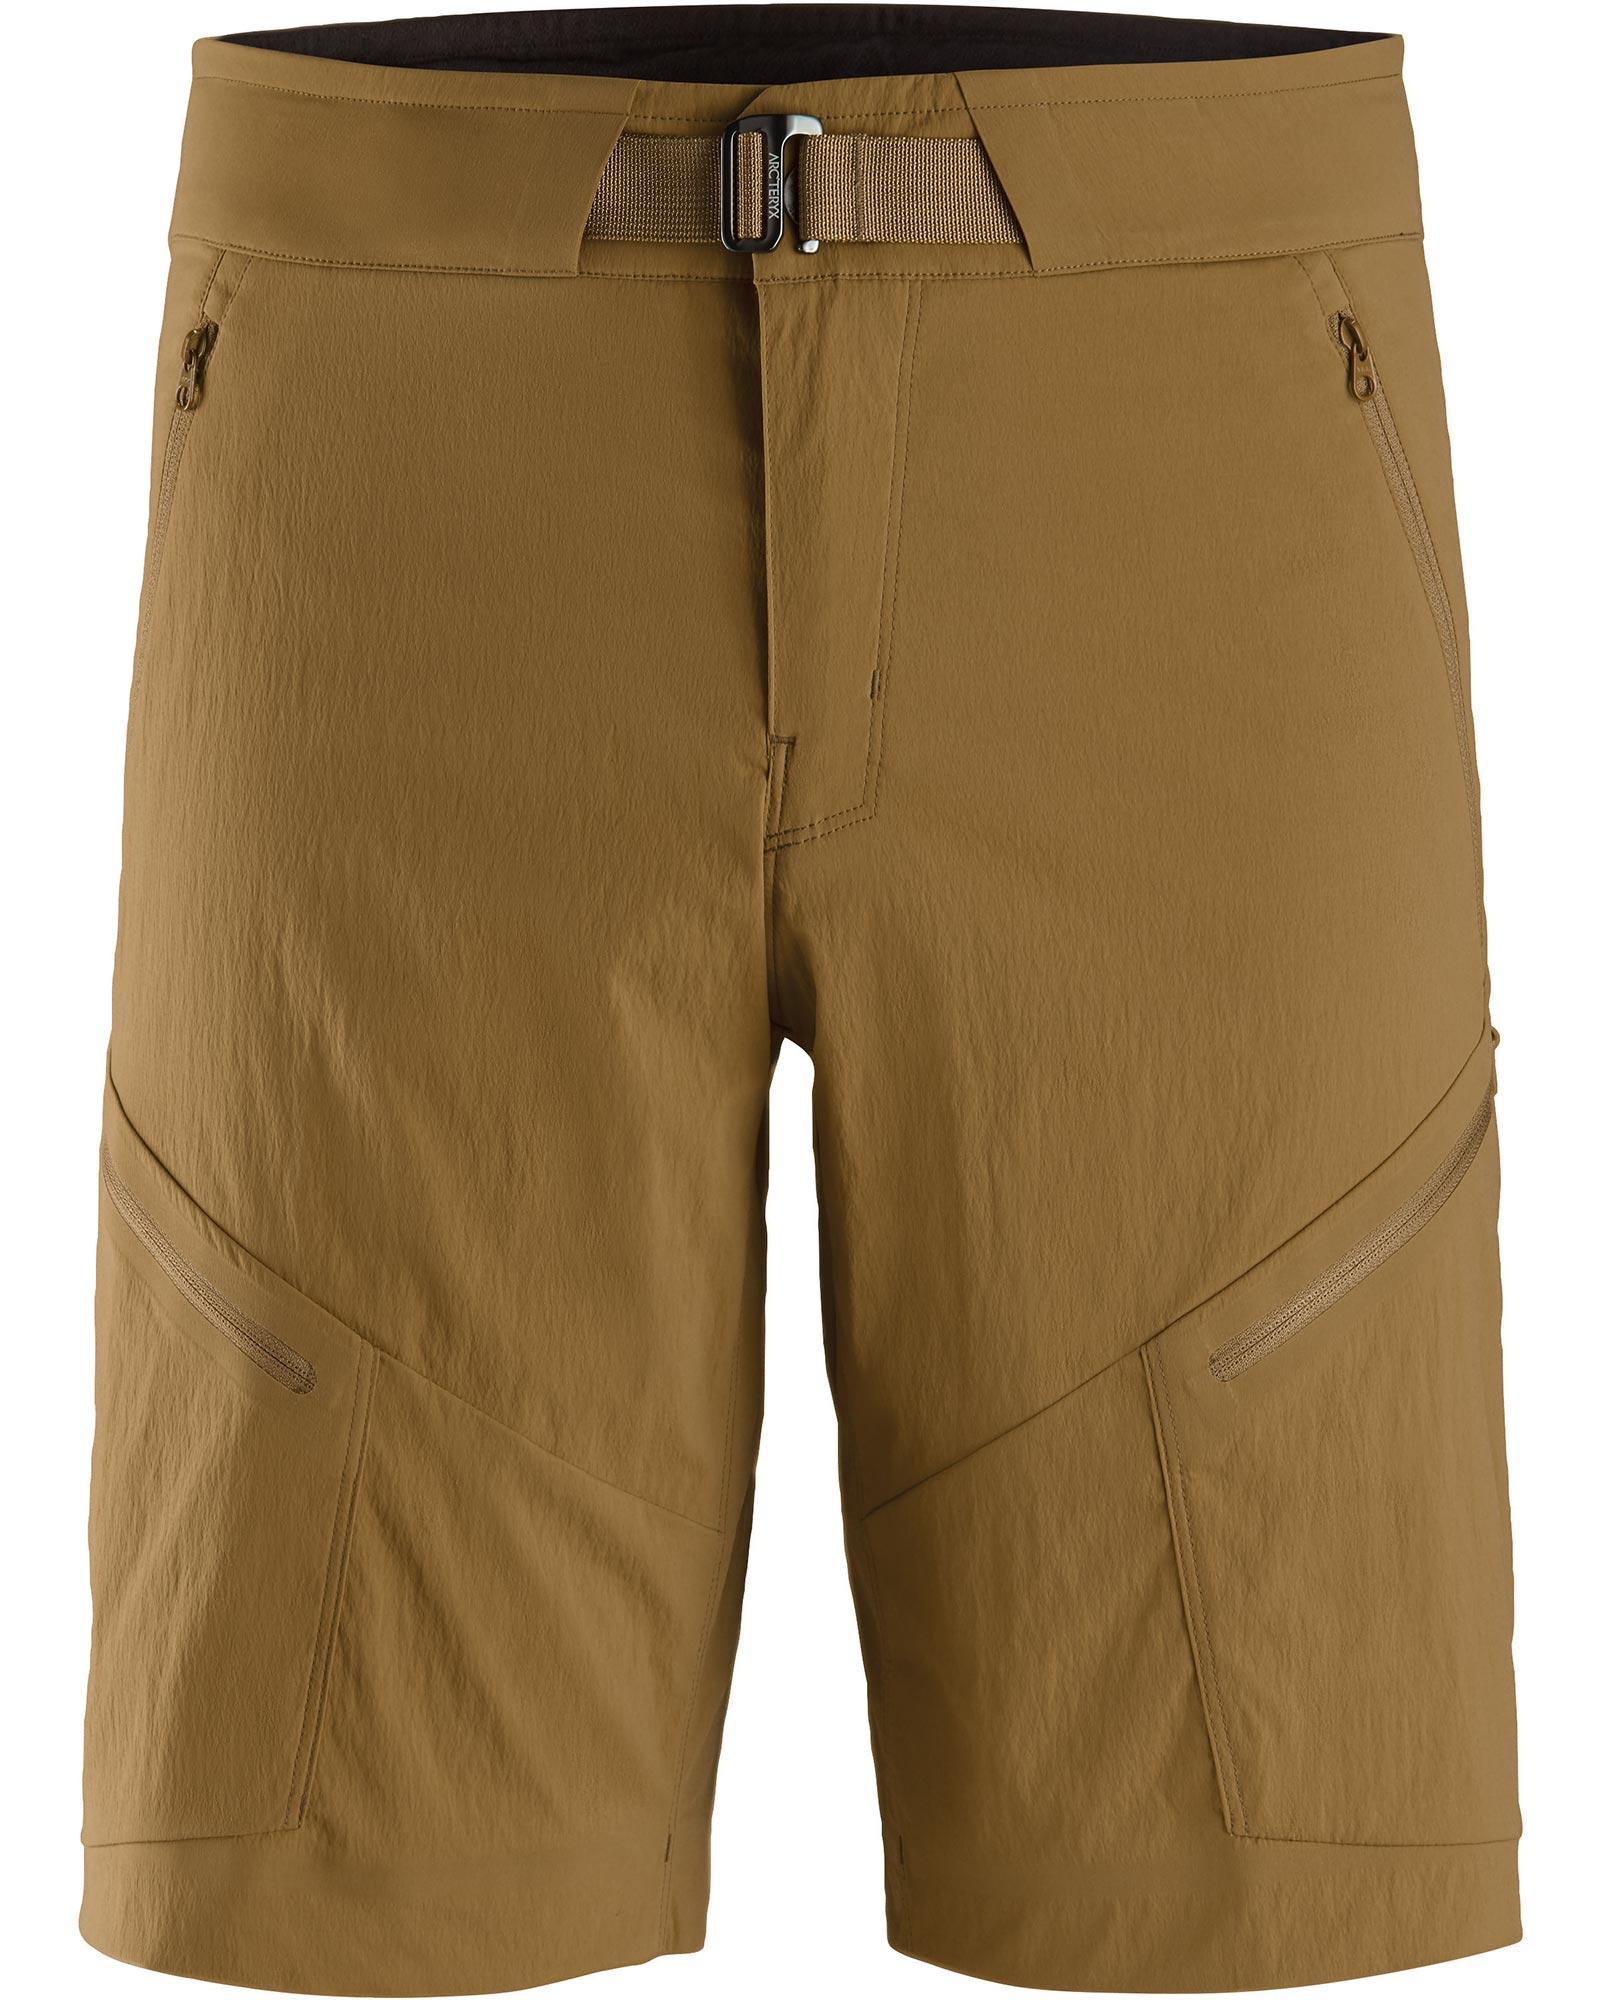 Arc'teryx Men's Palisade Shorts 0